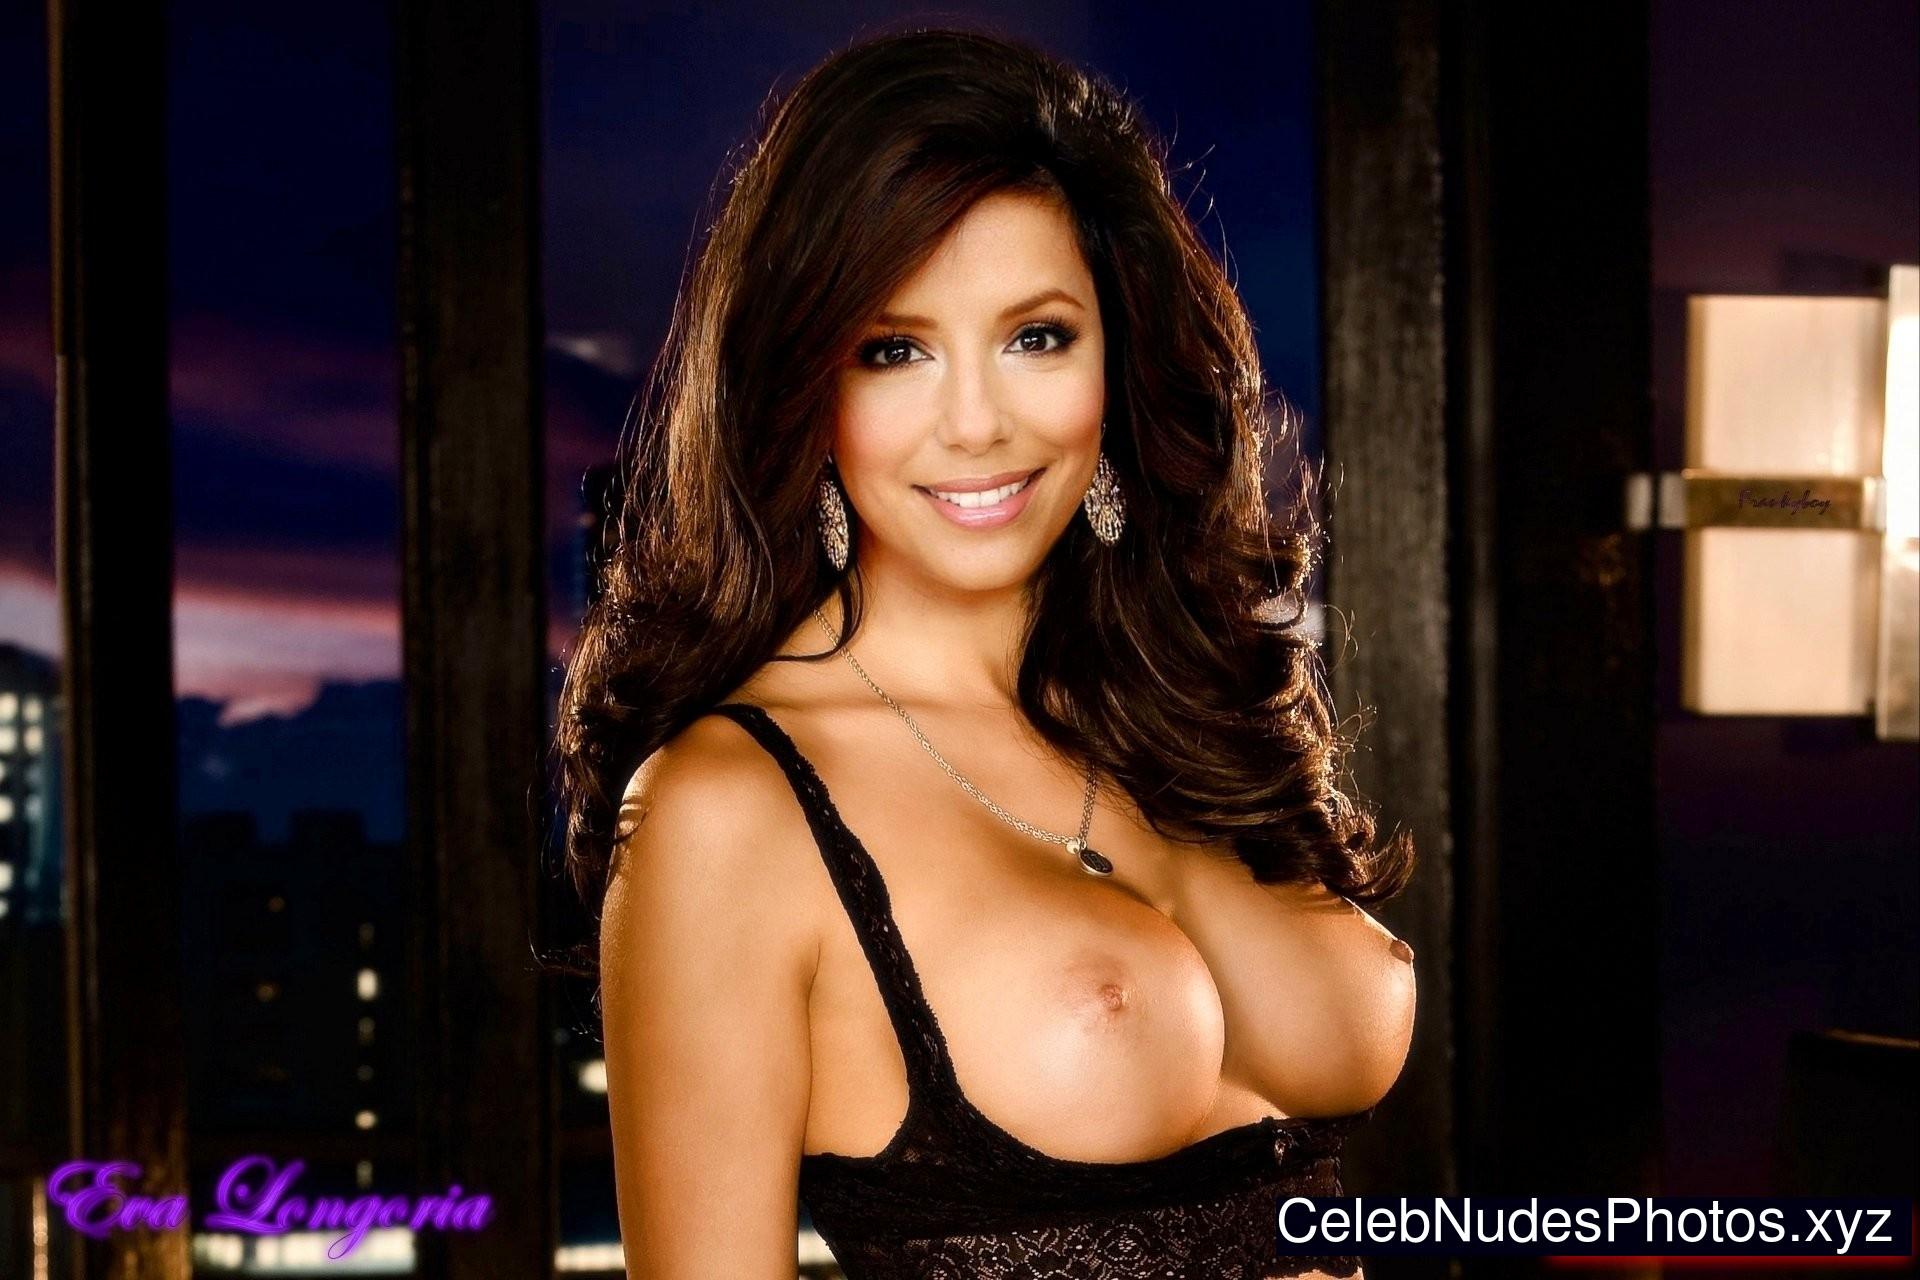 Eva Longoria Real Celebrity Nude sexy 28